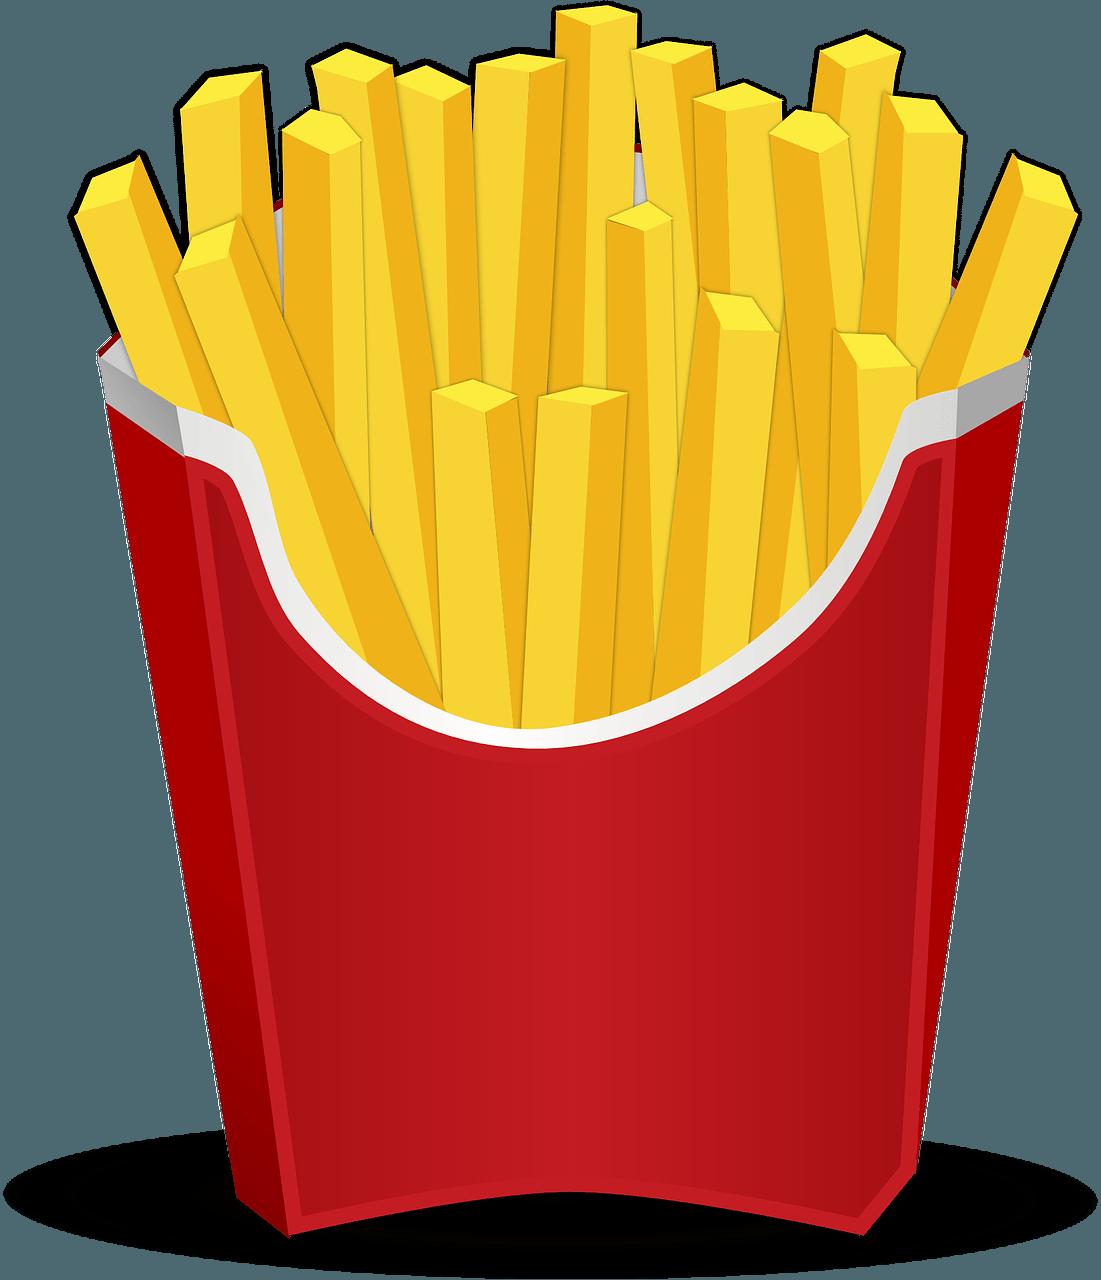 One clipart fry. Test vocabulario sobre la